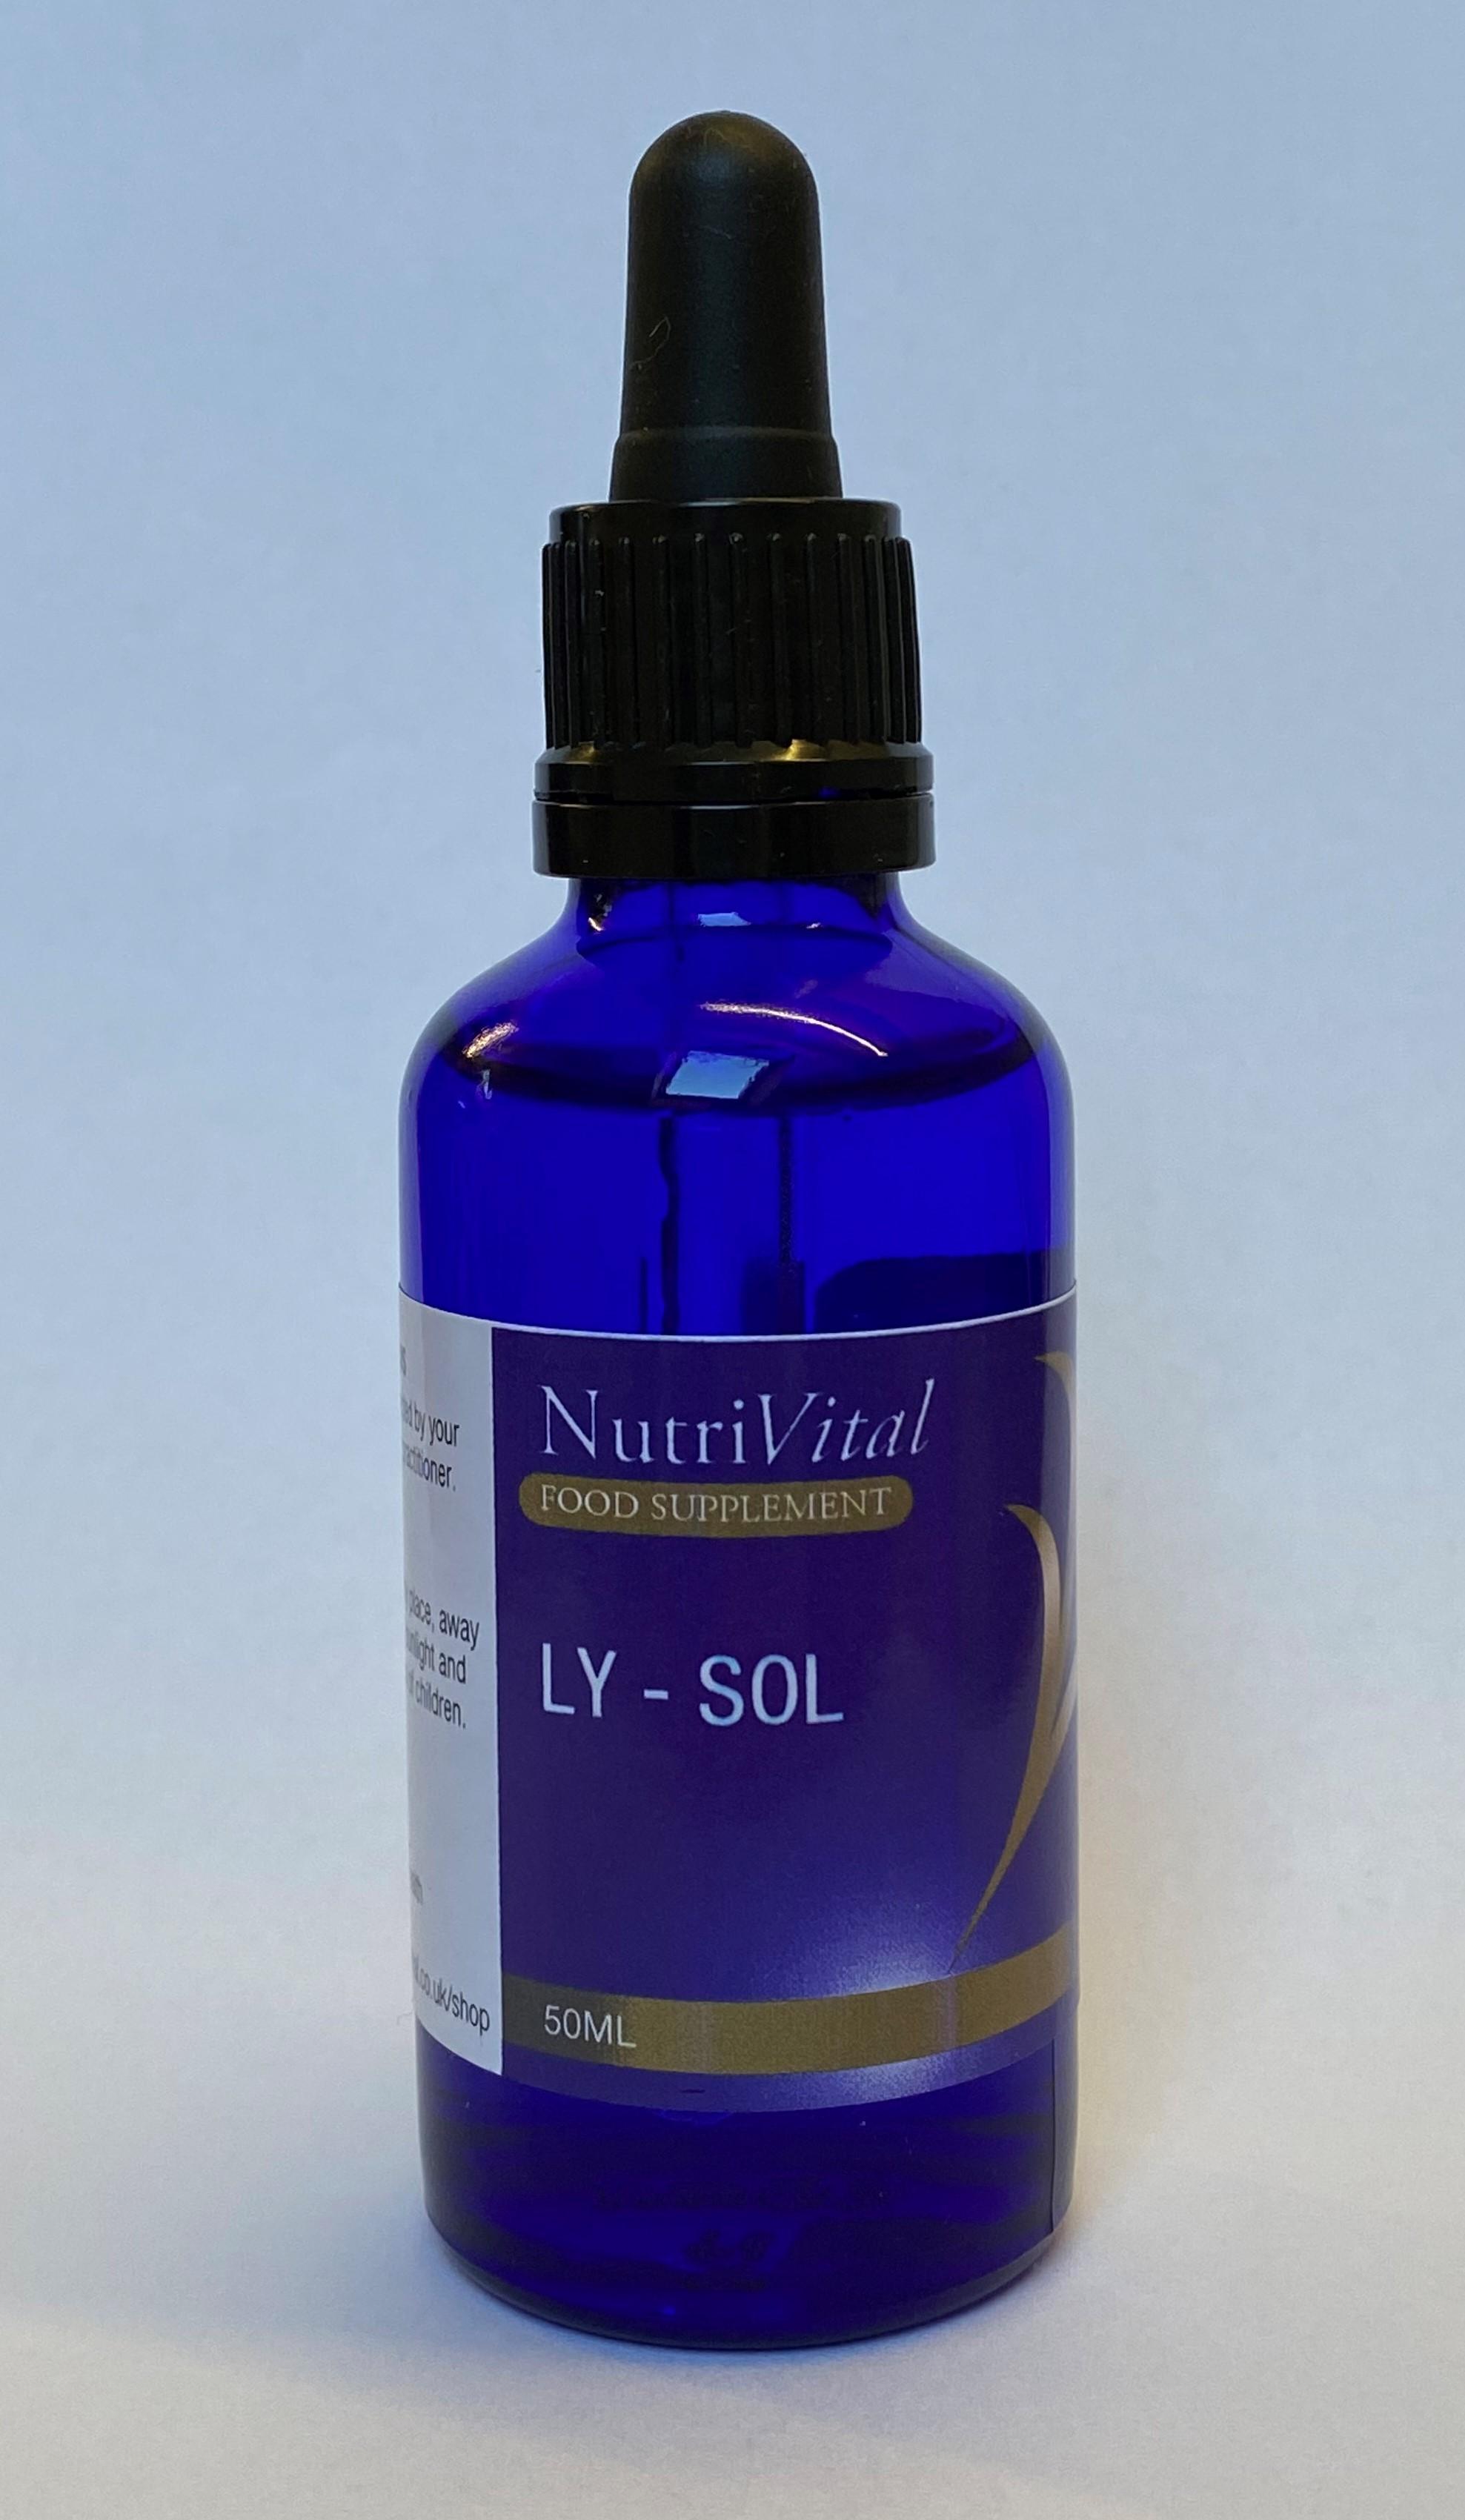 LY-SOL 50ml